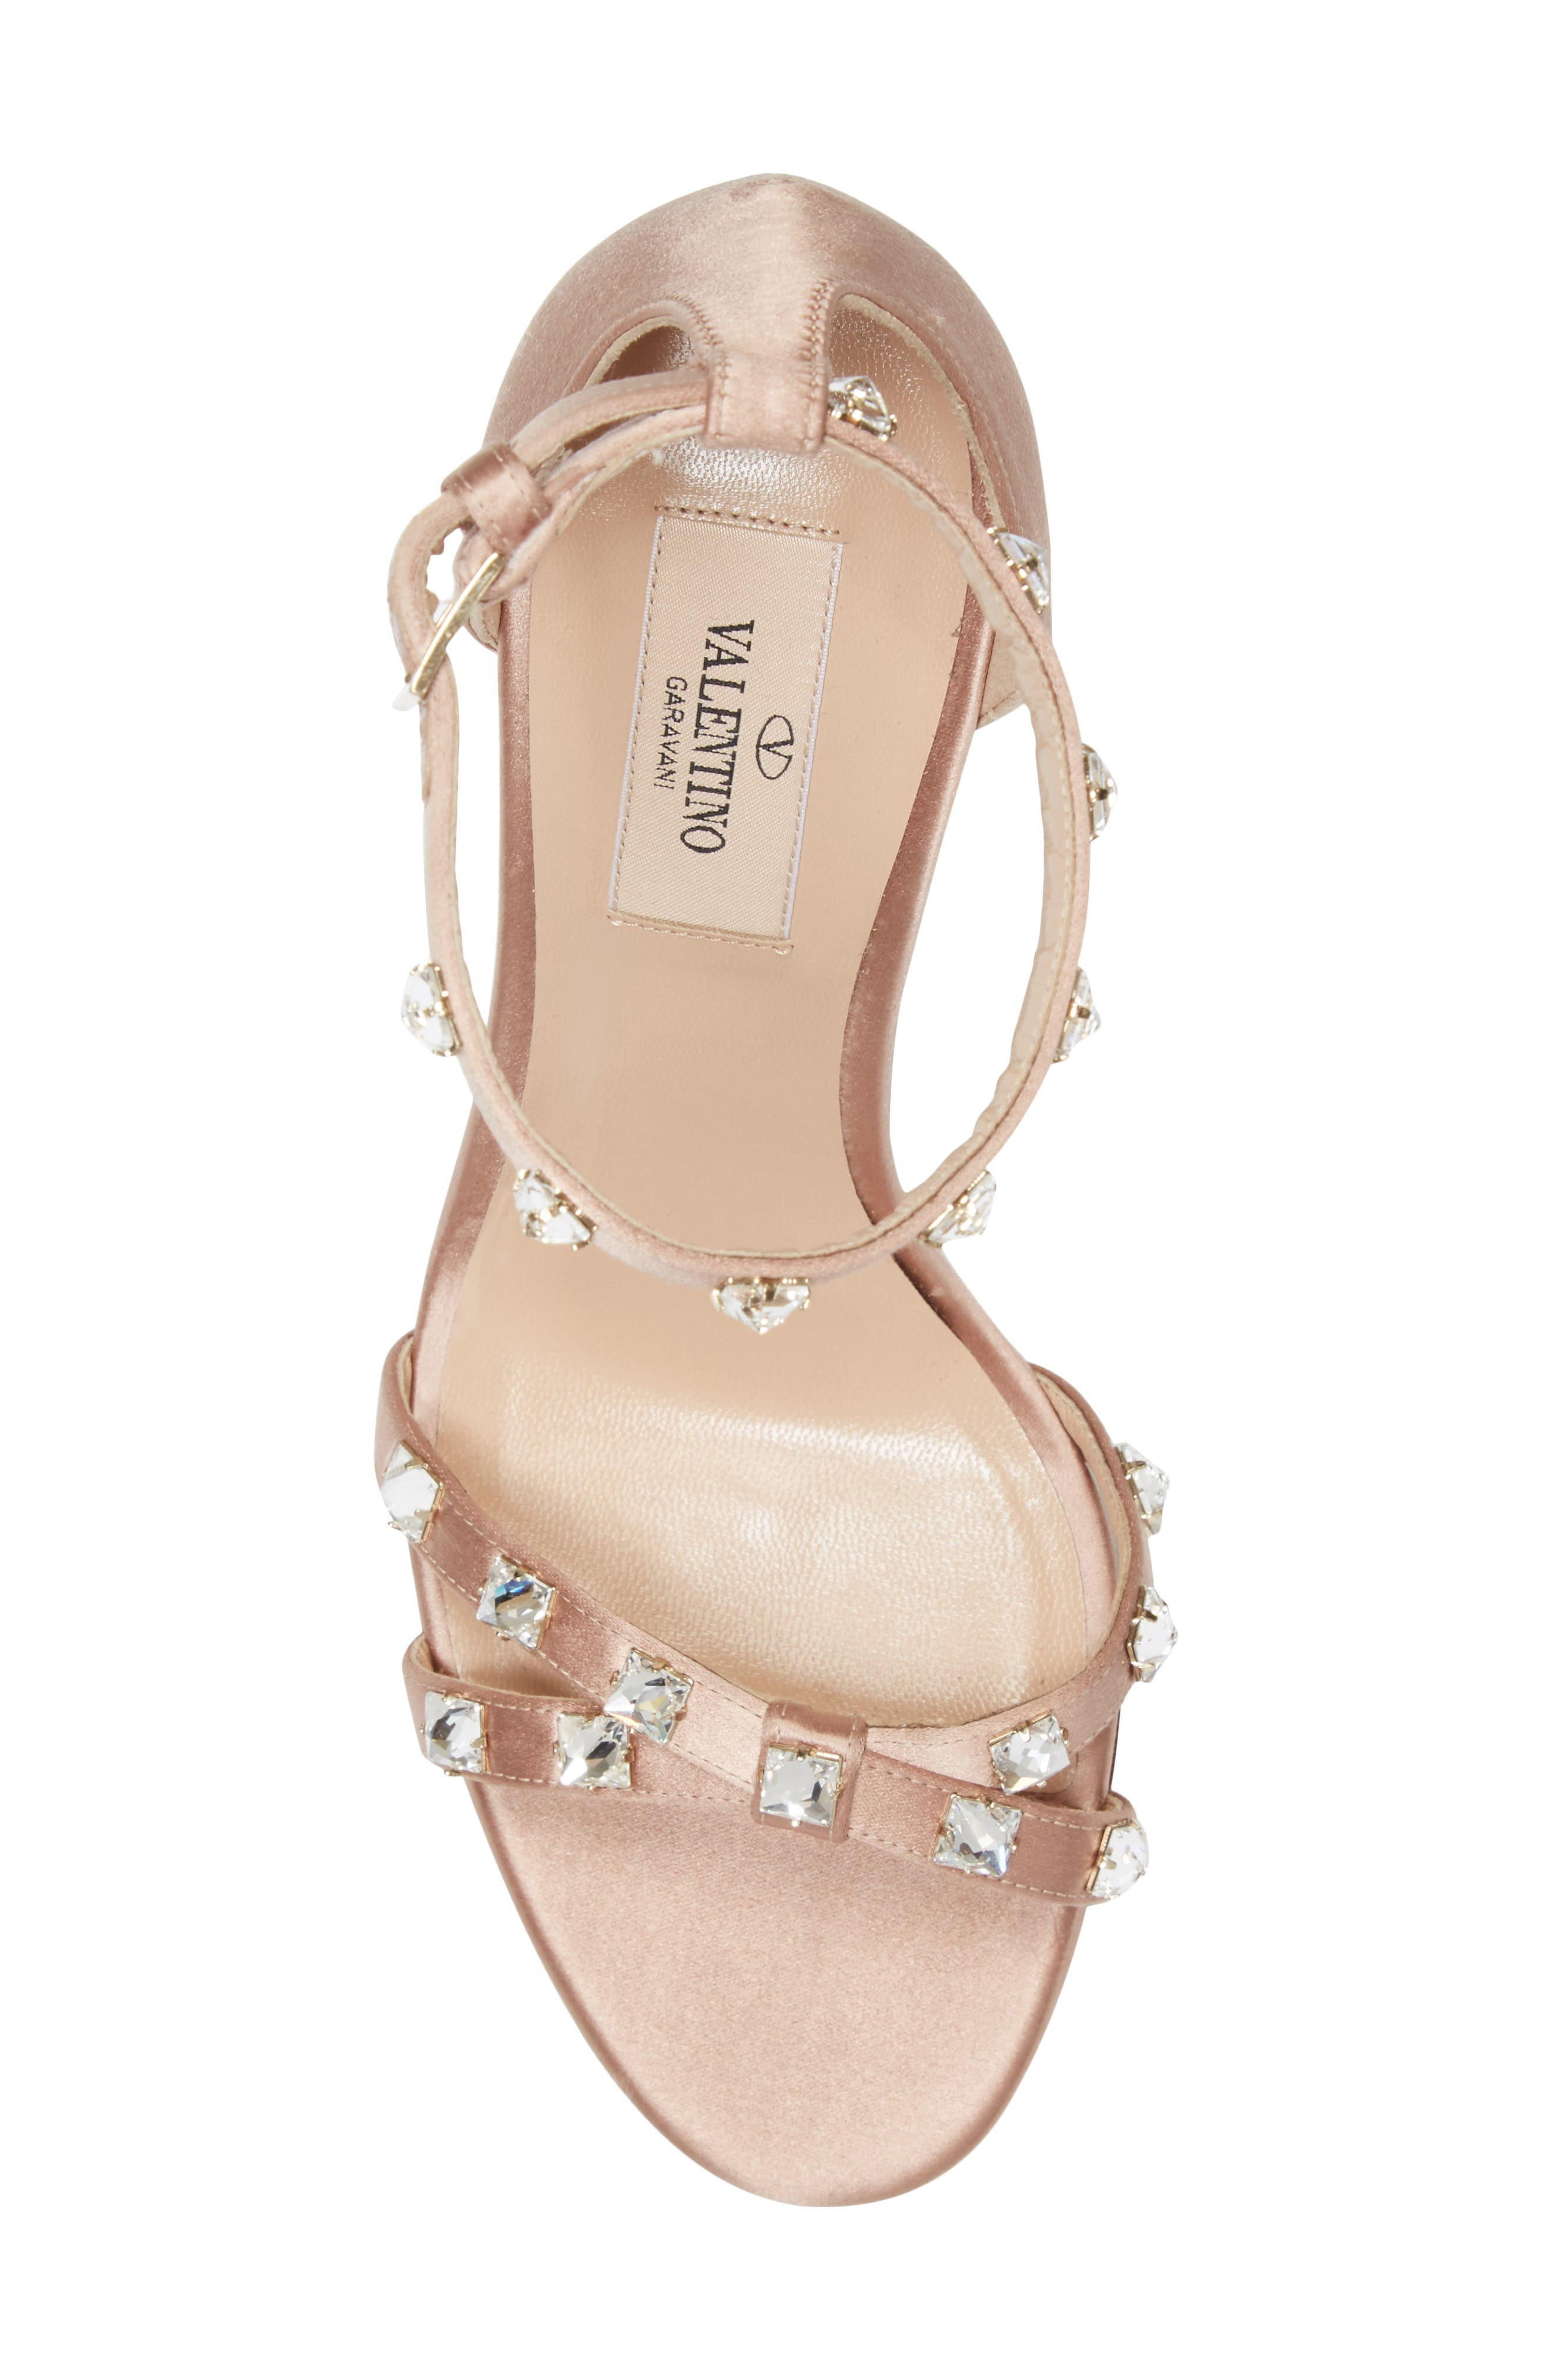 Rockstud Glam Ankle Strap Sandal,                             Alternate thumbnail 5, color,                             250